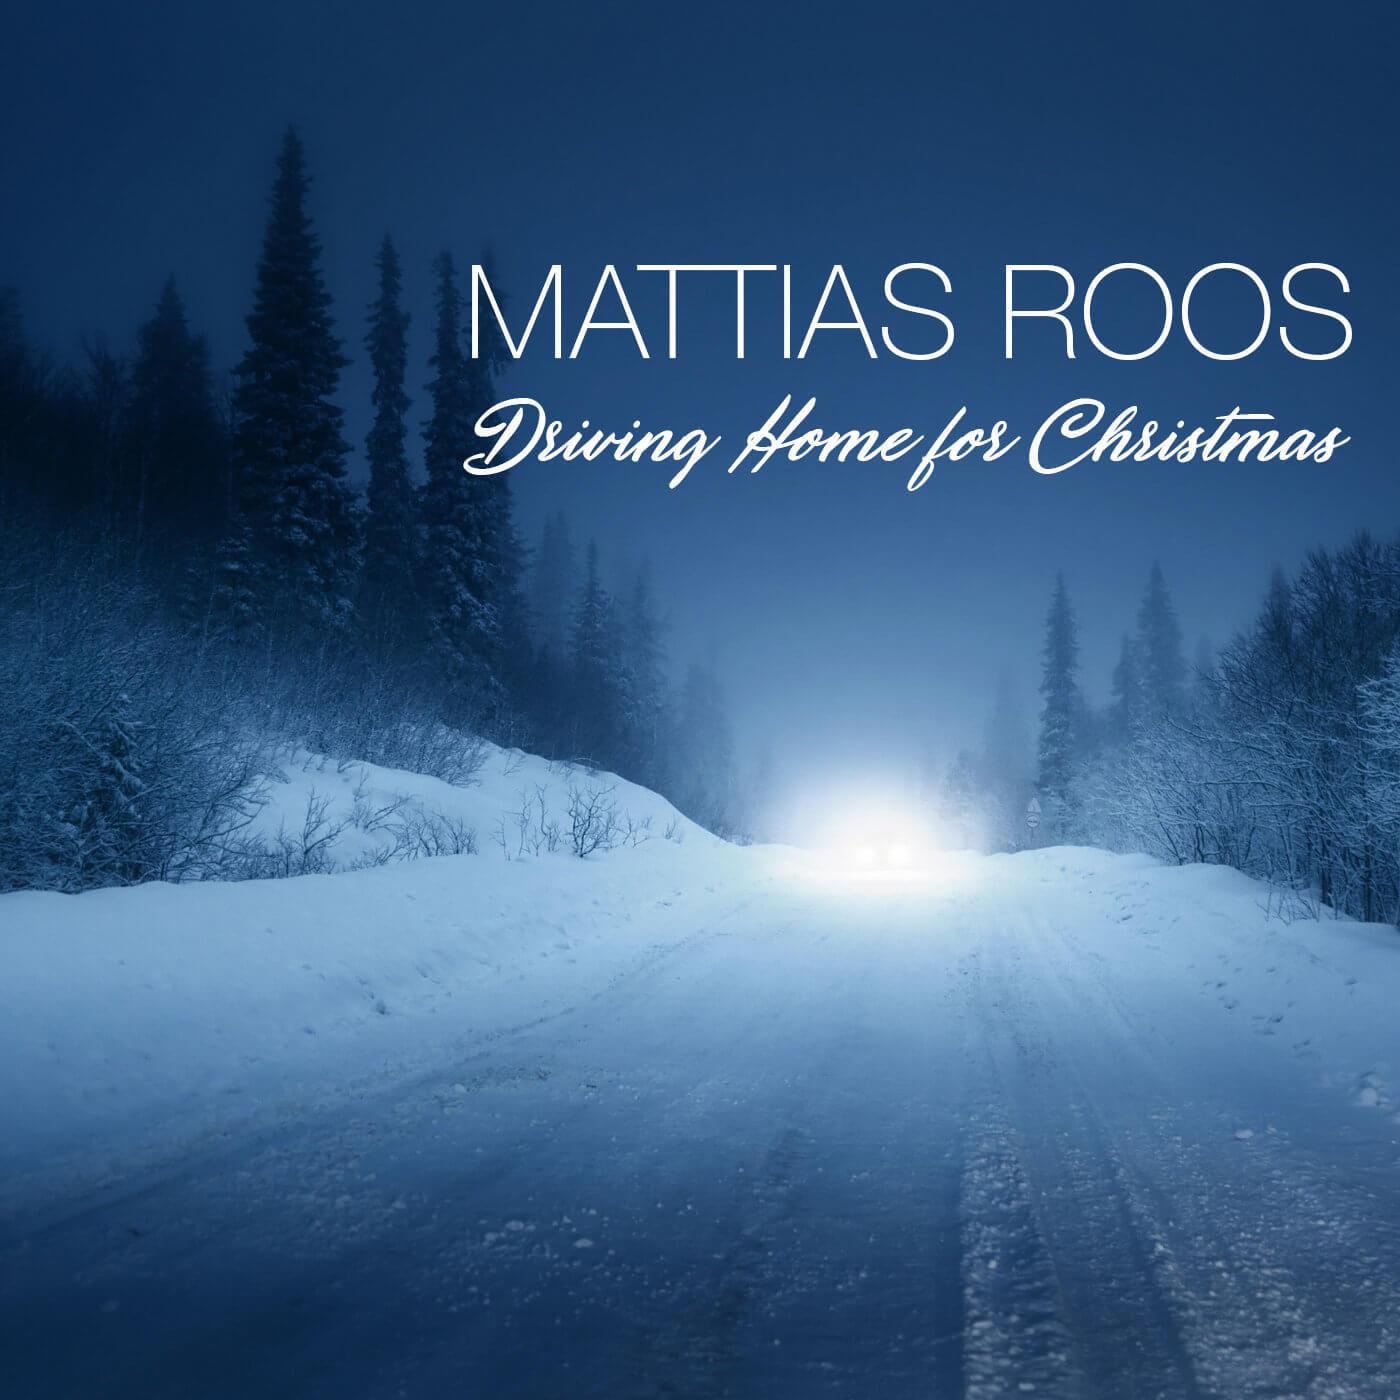 Mattias Roos New Christmas EP Release